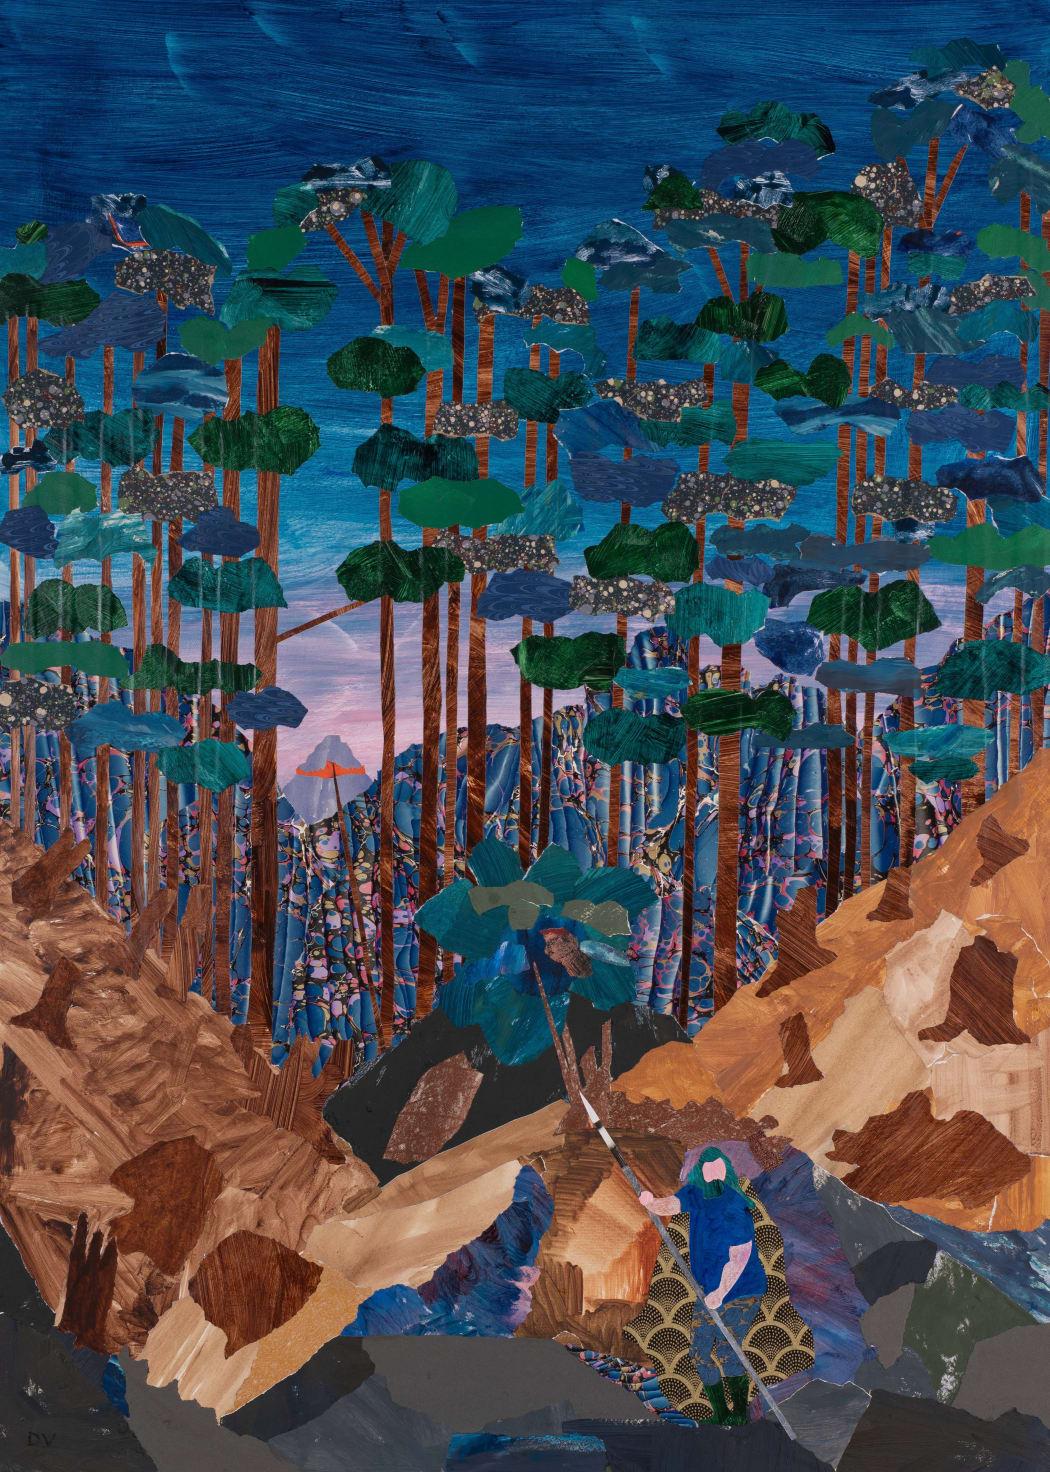 Dione Verulam, Wotan and Brunnhilde's Rock, collage, 120 x 87 cms